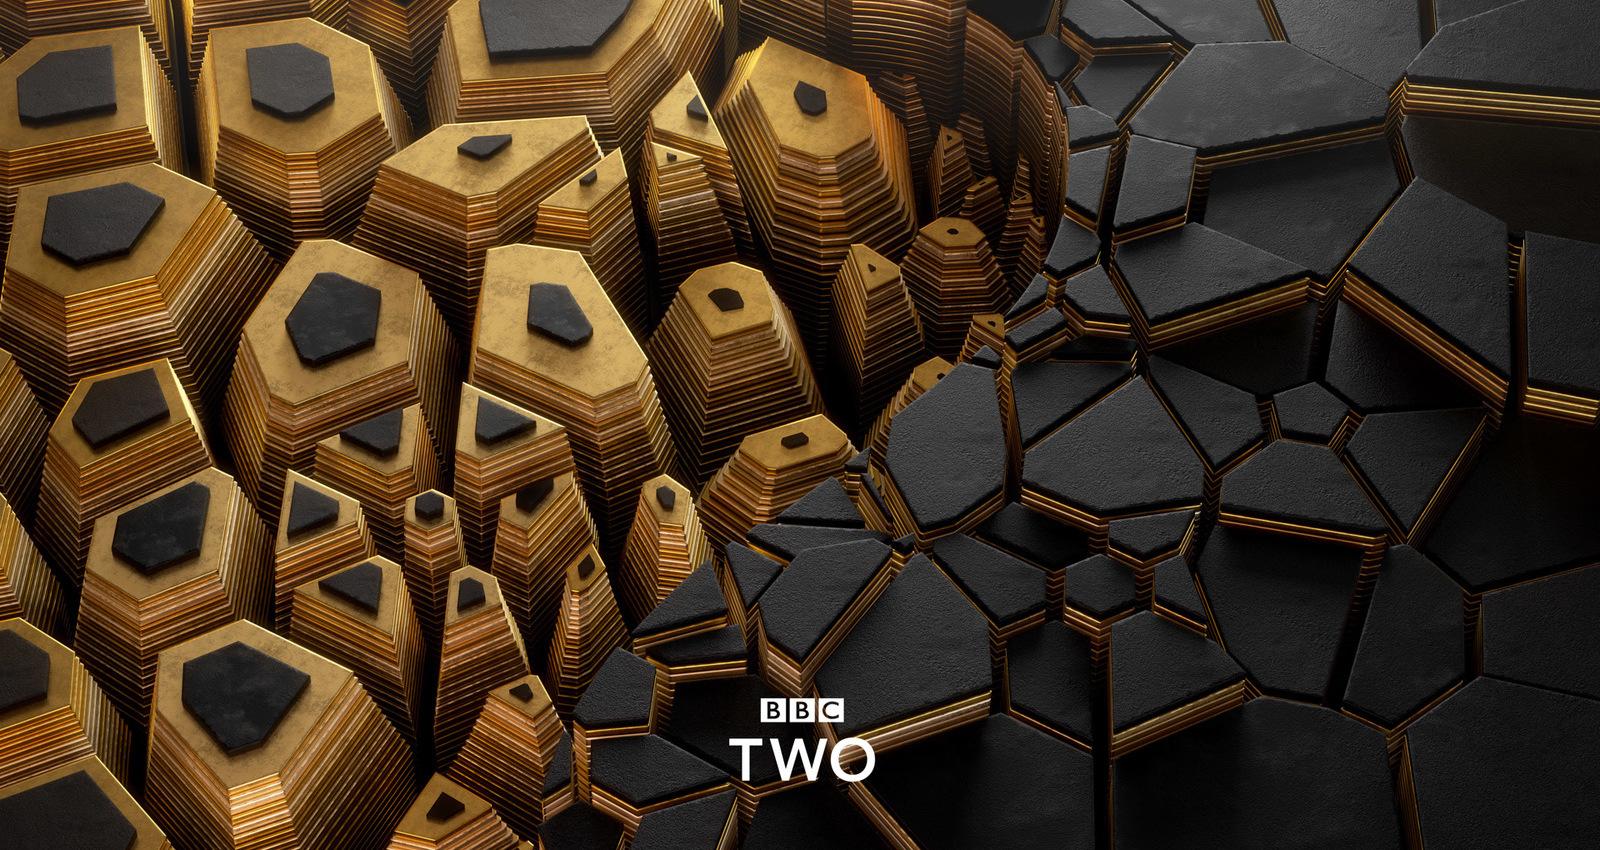 BBC Two Rebrand